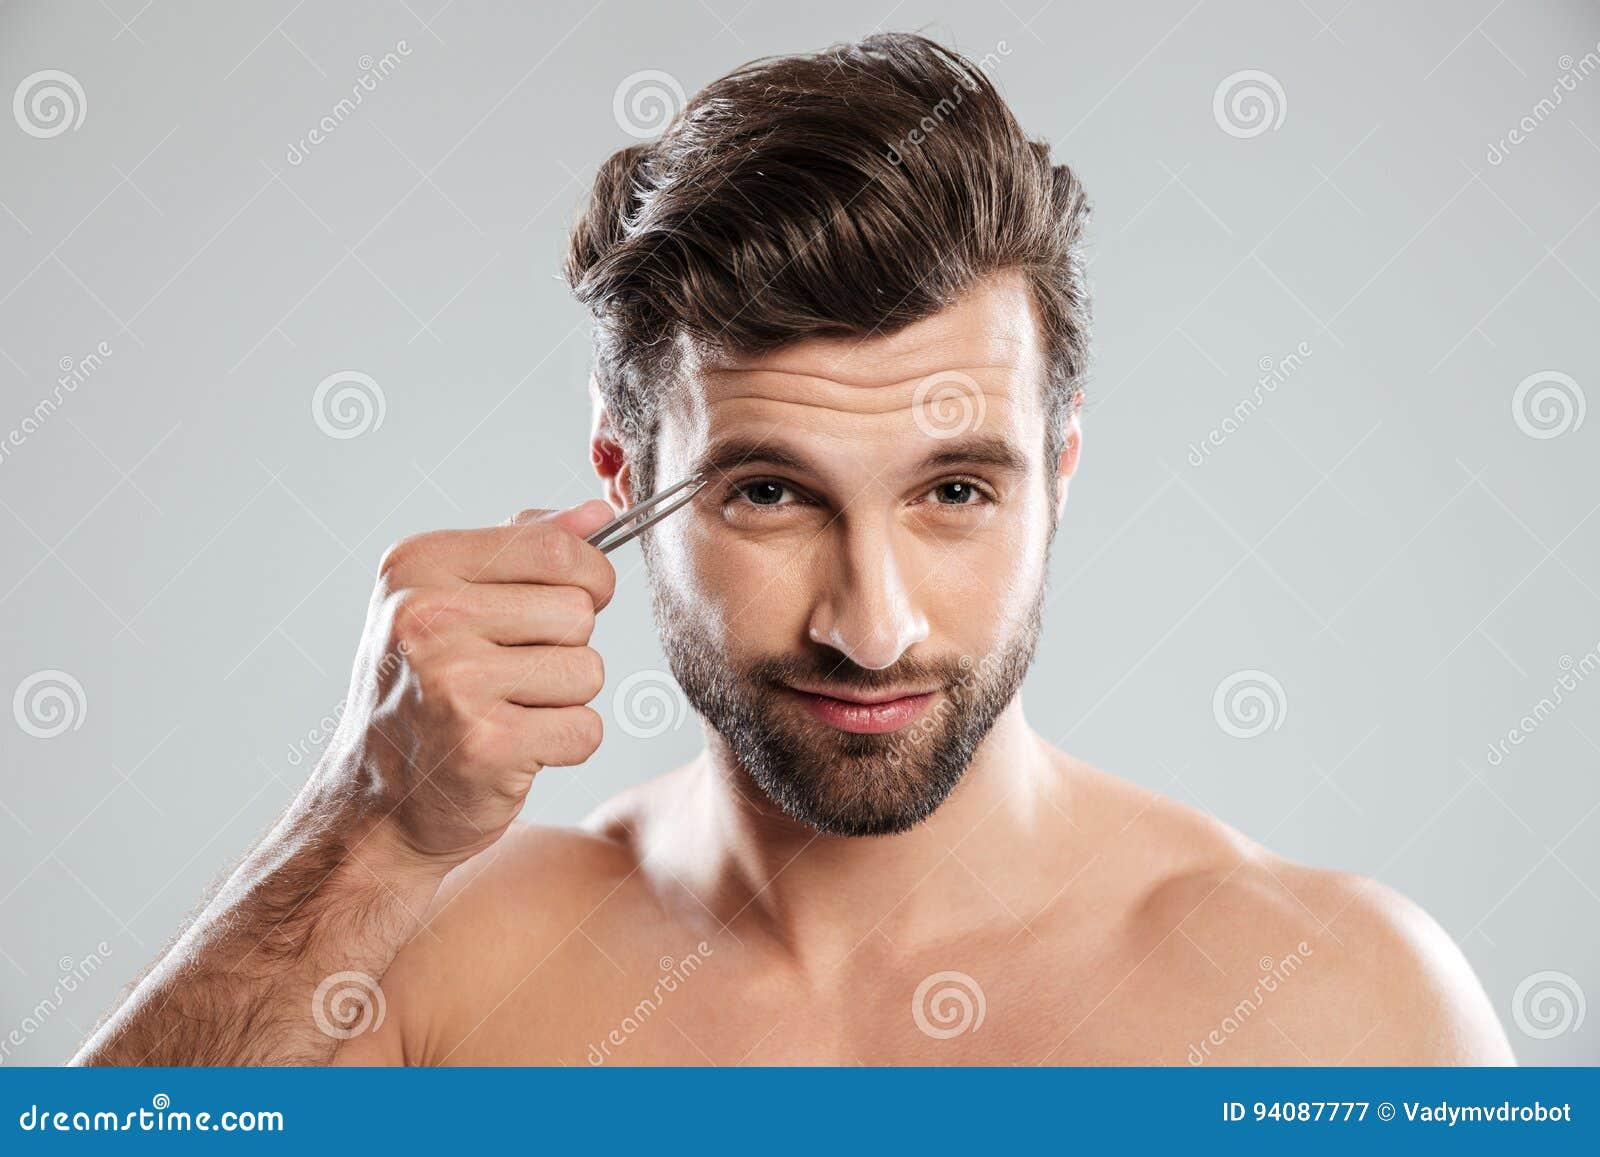 Man Tweezing His Eyebrows Isolated Stock Image Image Of Picking